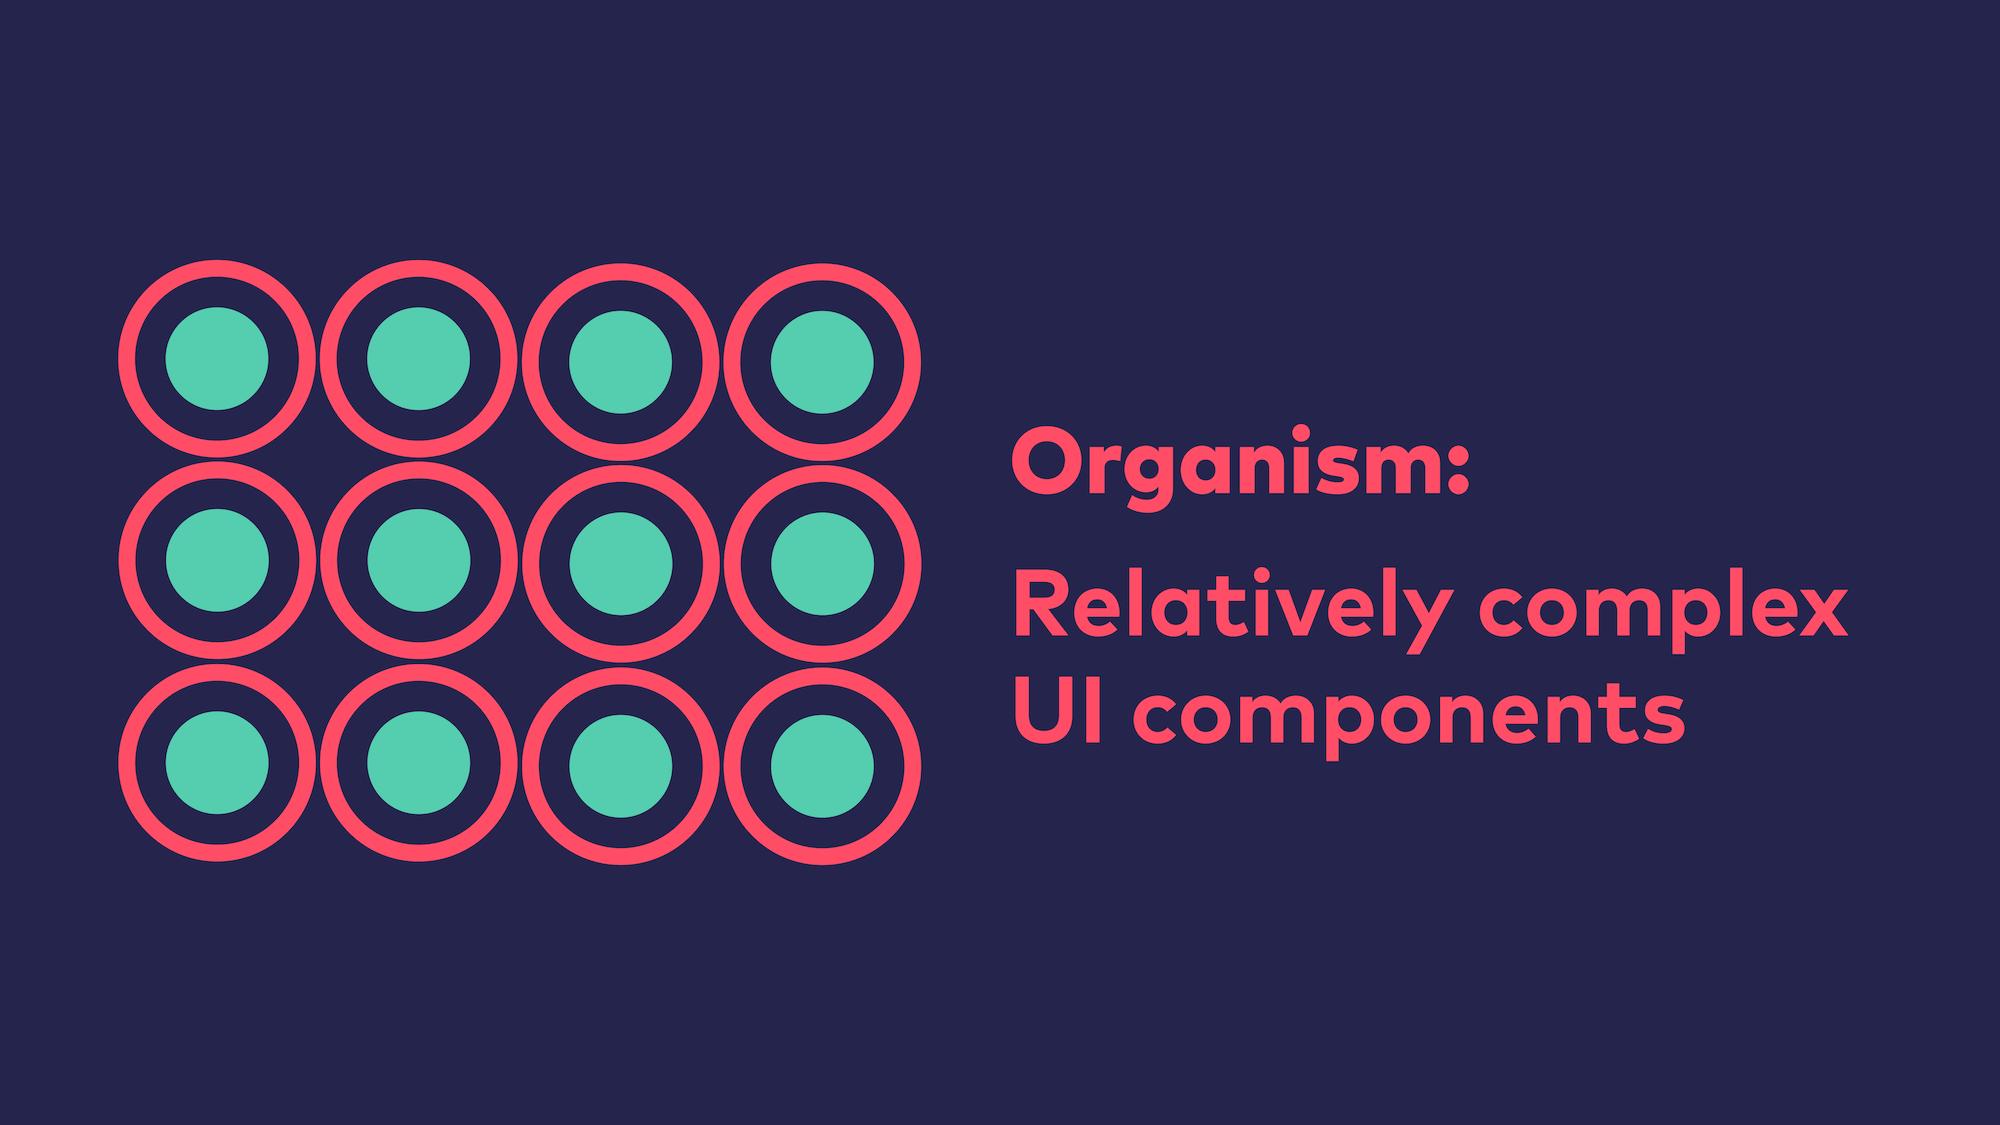 Abb. 9: Atomic Design - Organismus